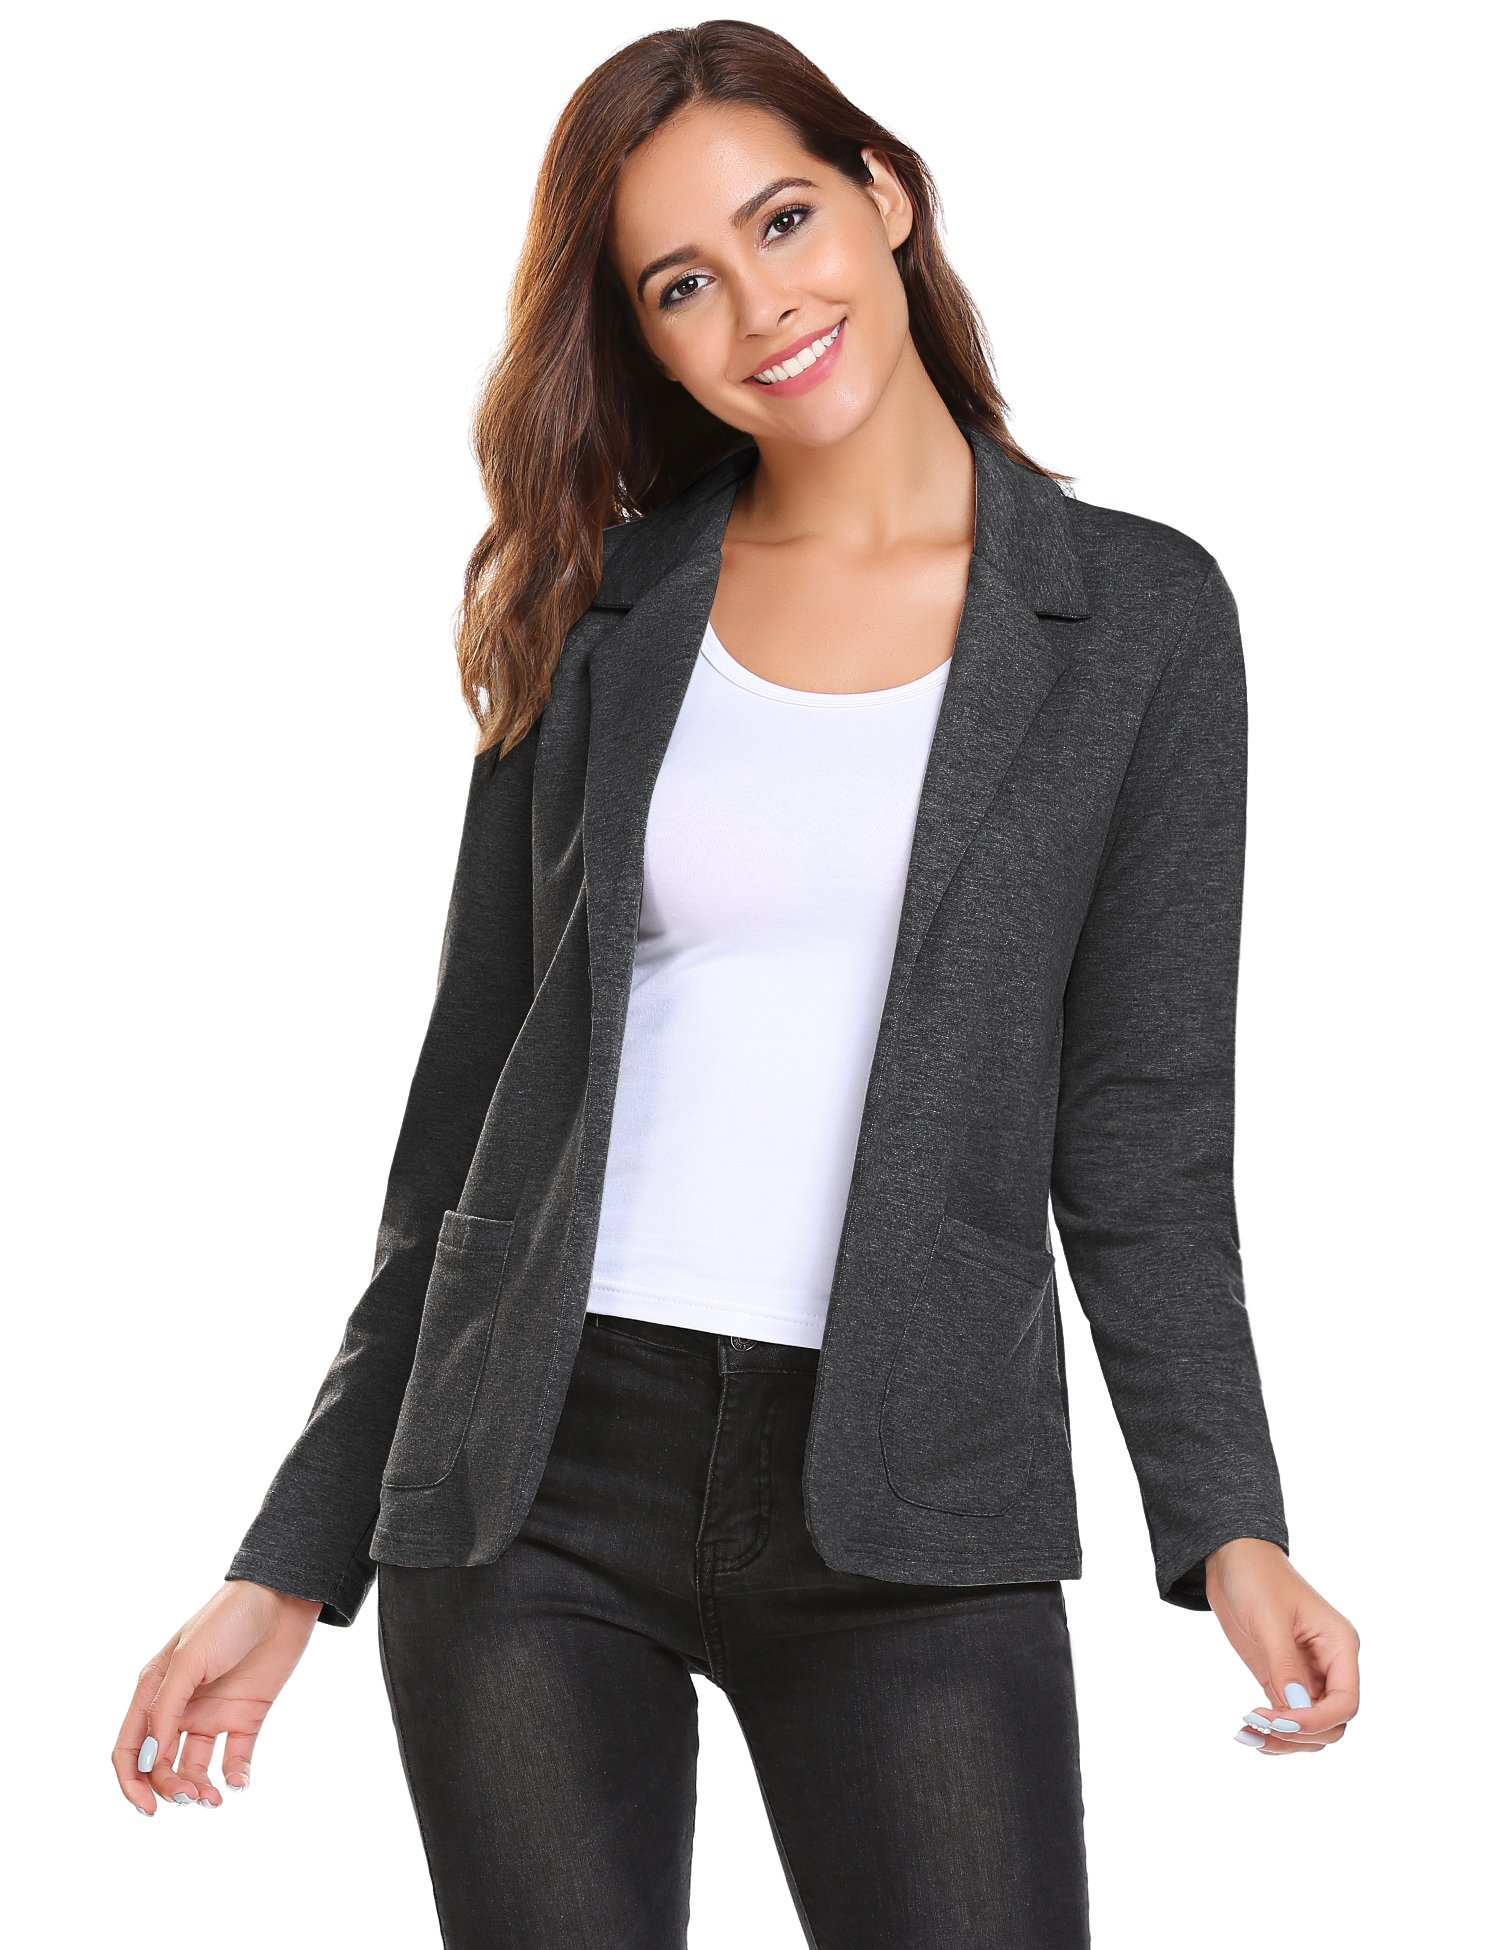 Zeagoo Blazer for Women Ladies Long Sleeves Jersey Cardigans Plus Size Cotton Jacket (Grey, M)